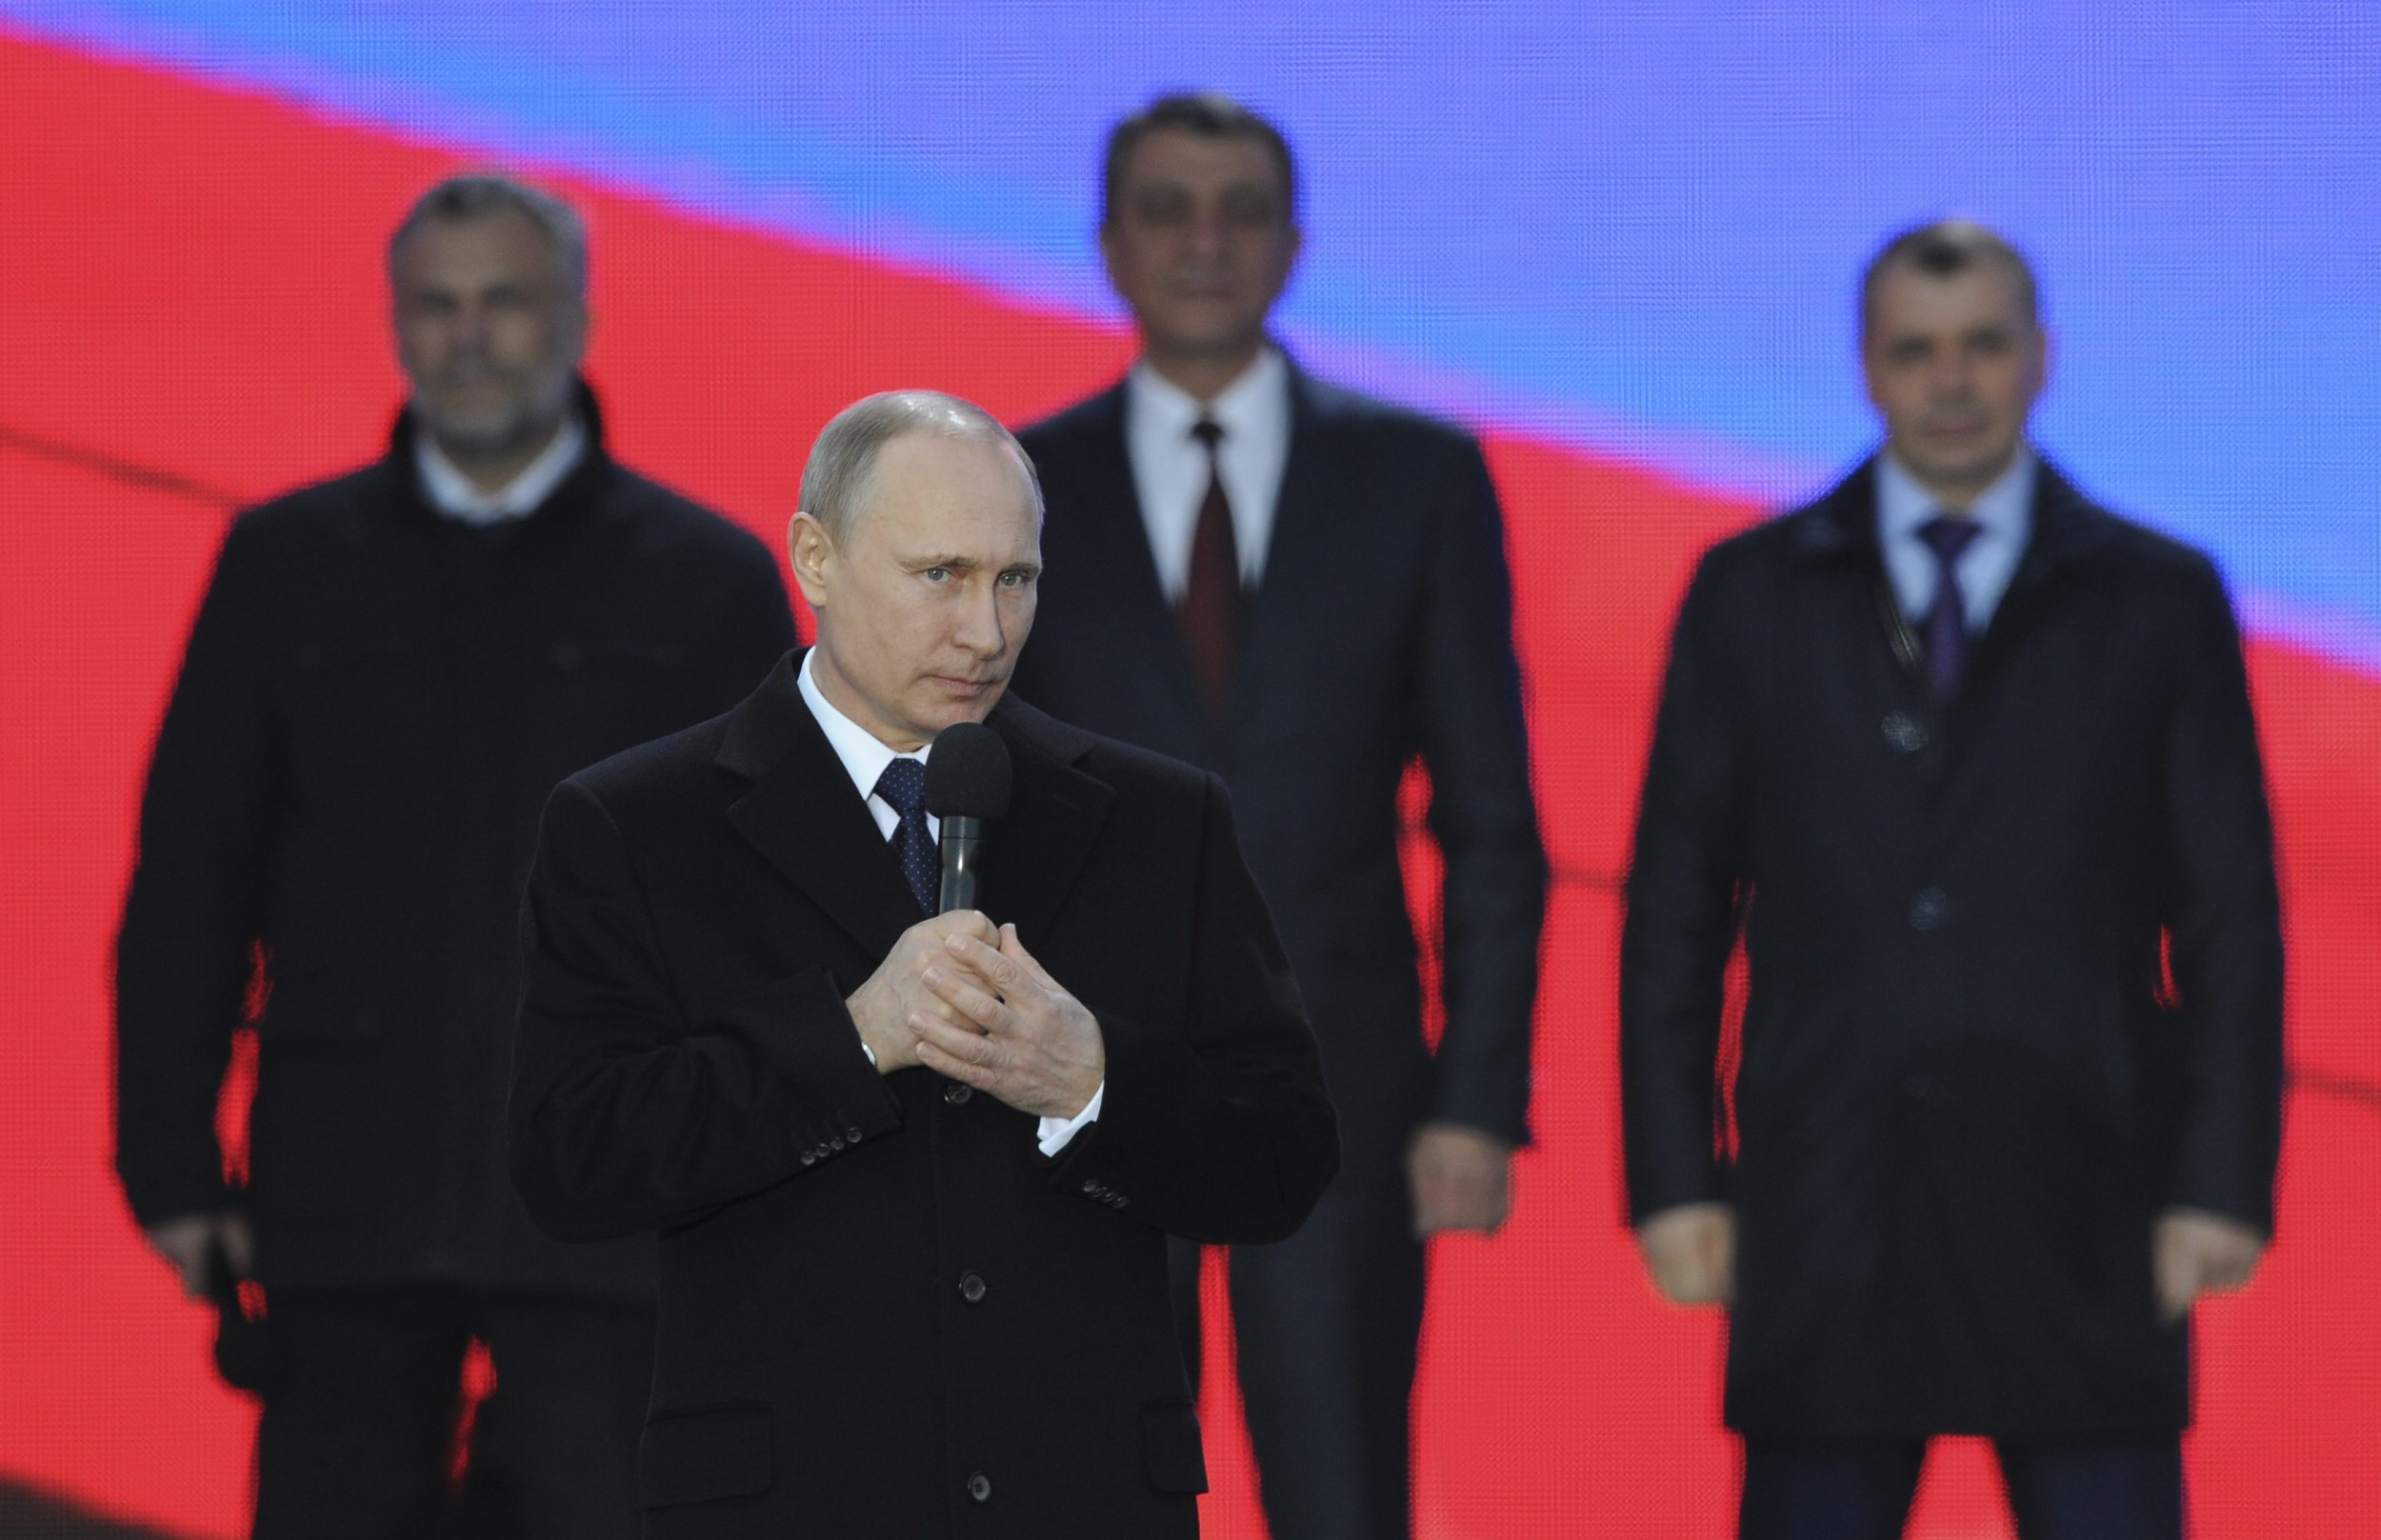 2015-03-20T094809Z_1_LYNXMPEB2J0DV_RTROPTP_4_UKRAINE-CRISIS-PUTIN